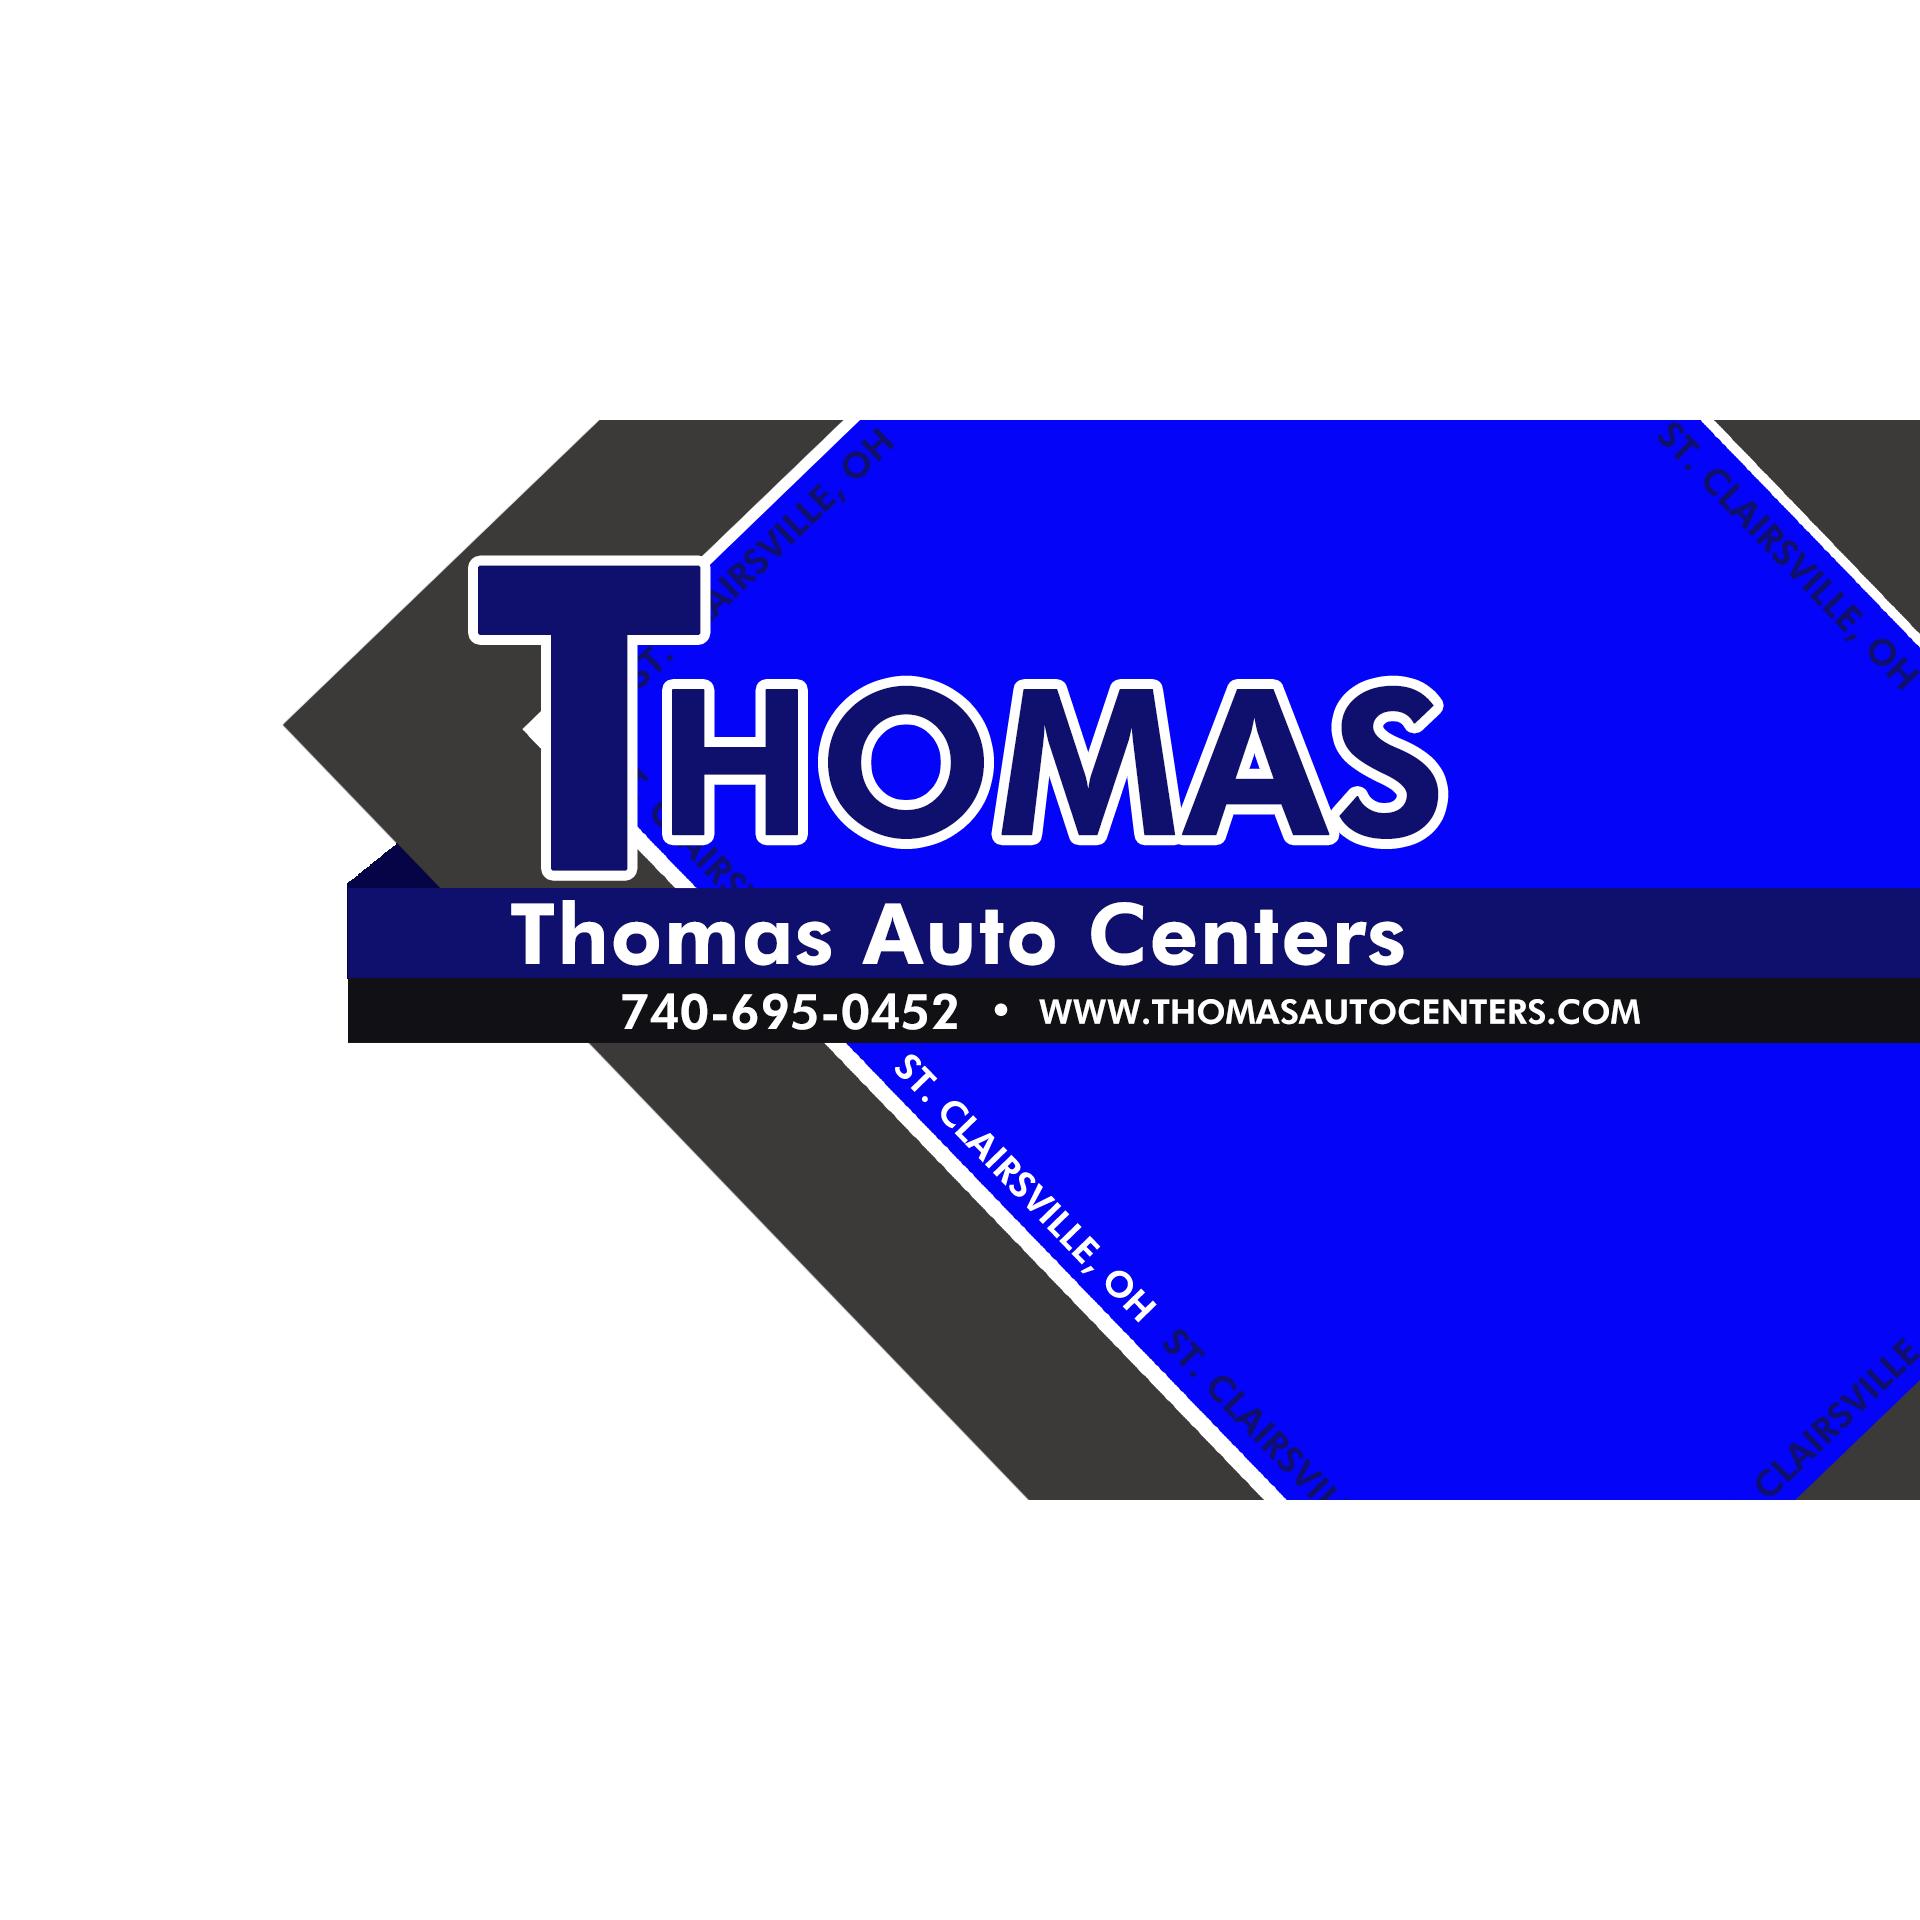 Thomas Auto Centers - St. Clairsville, OH - Auto Dealers